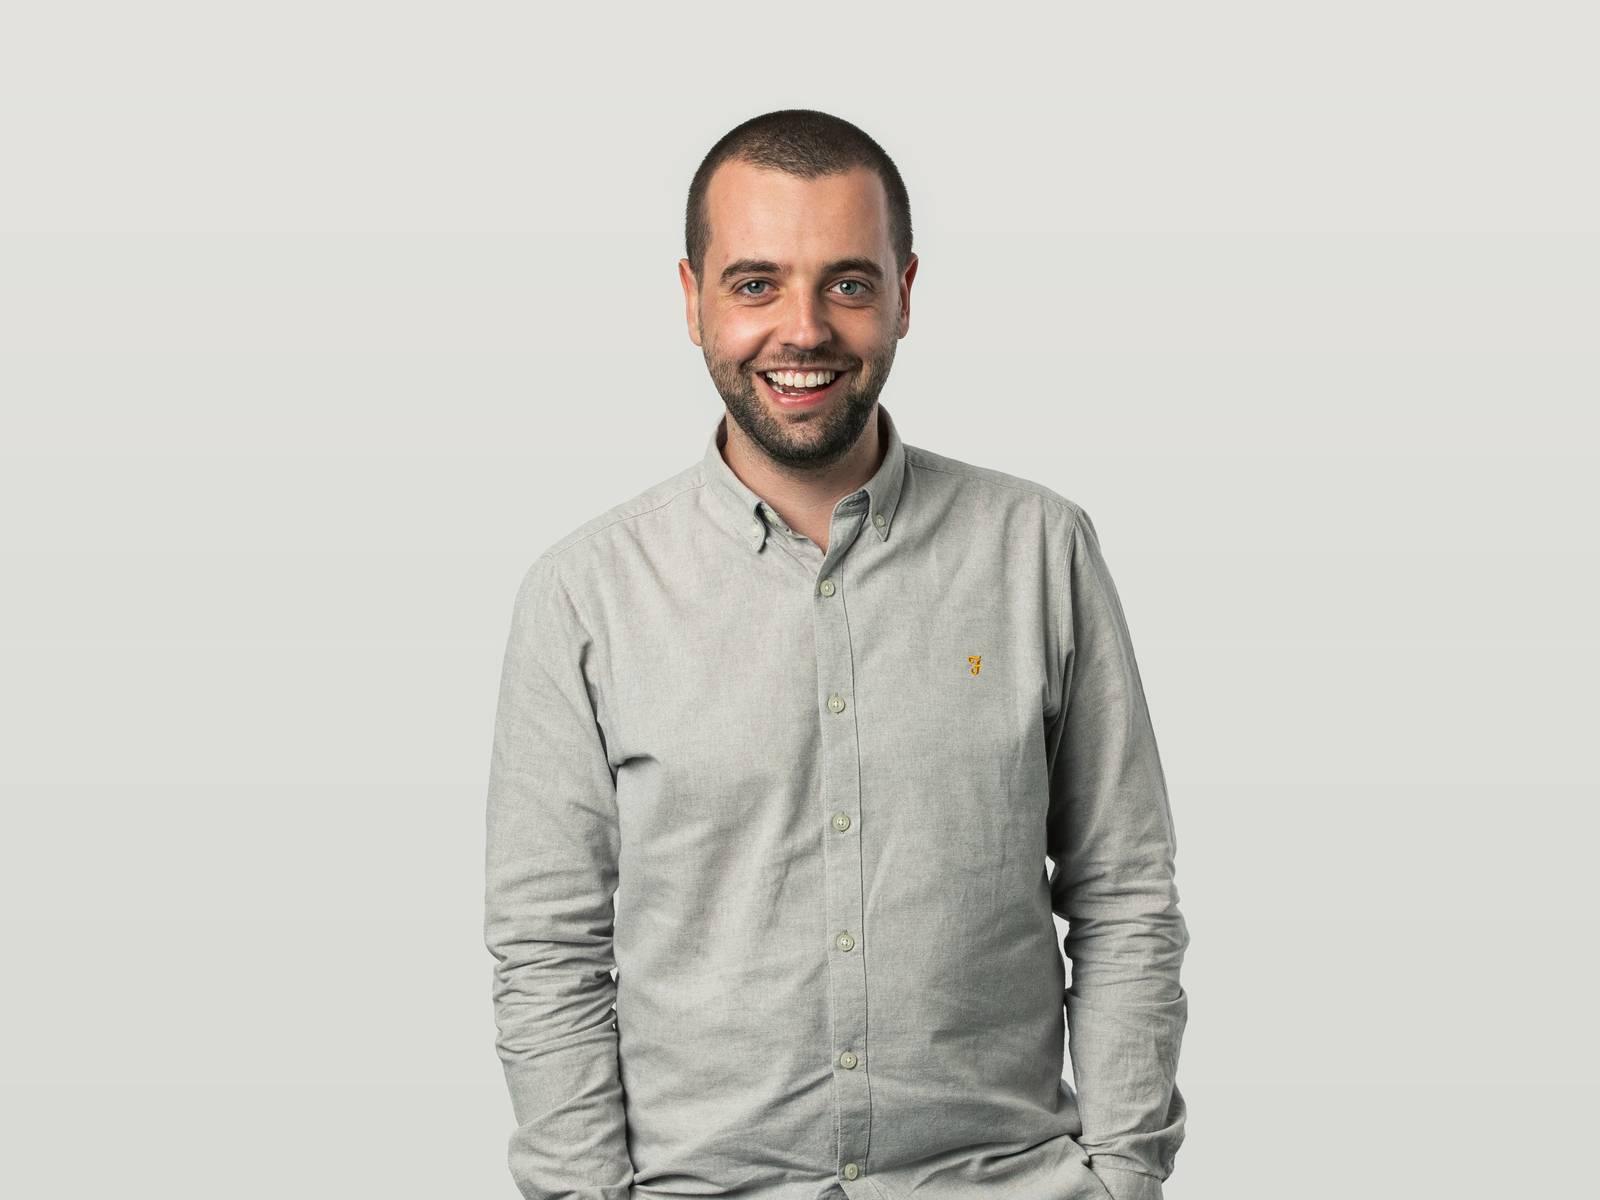 A profile image of Stuart Whitehead